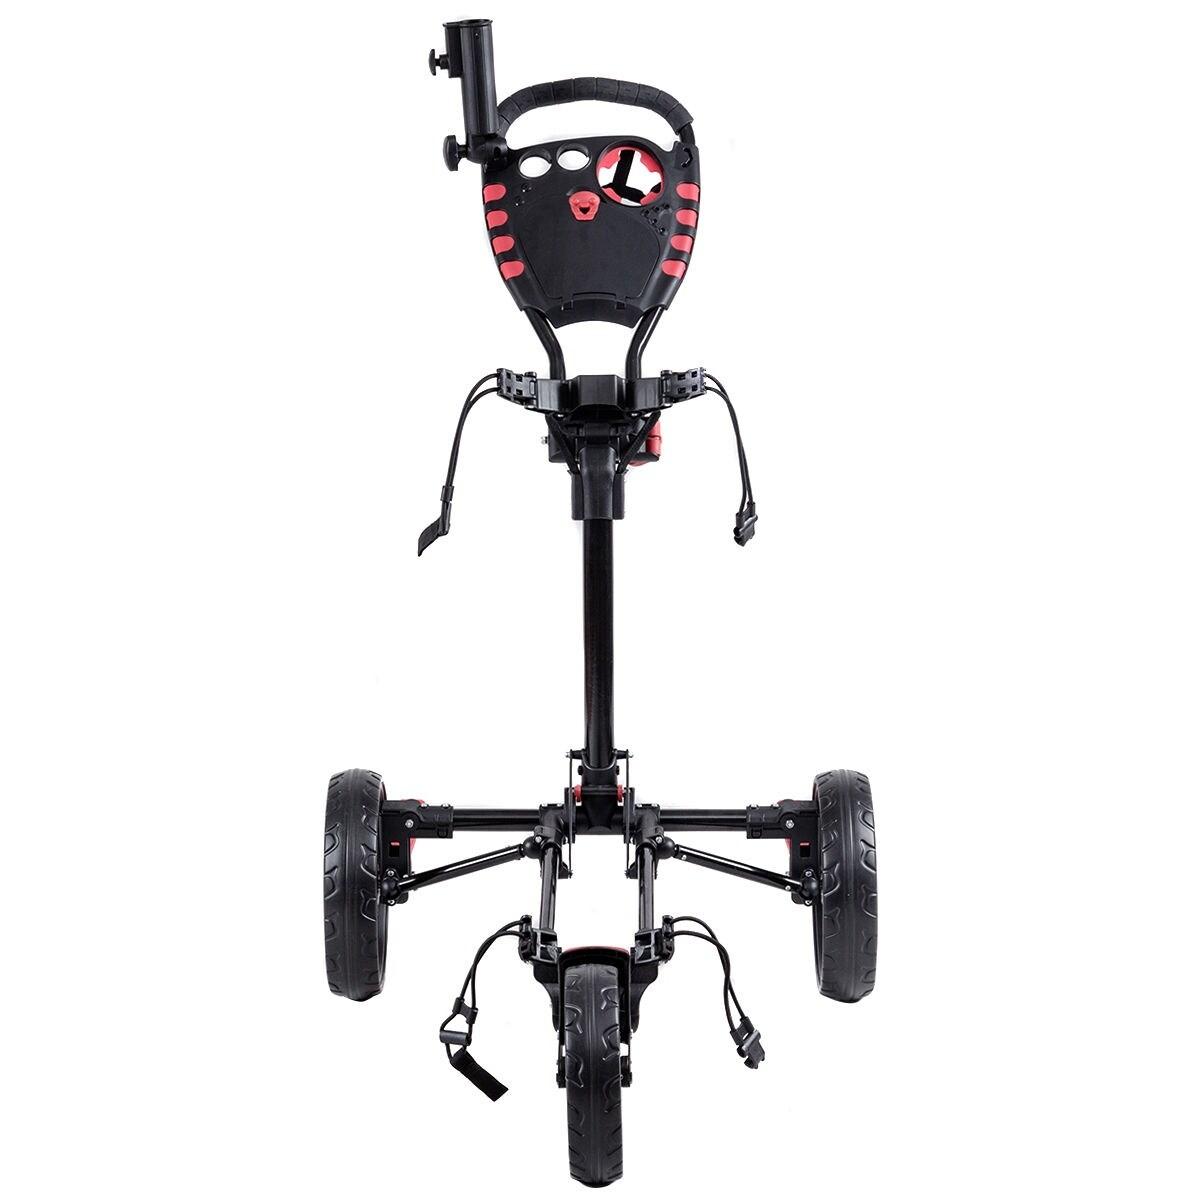 Shop Costway Lightweight Foldable 3 Wheel Golf Pull Push Cart ... on